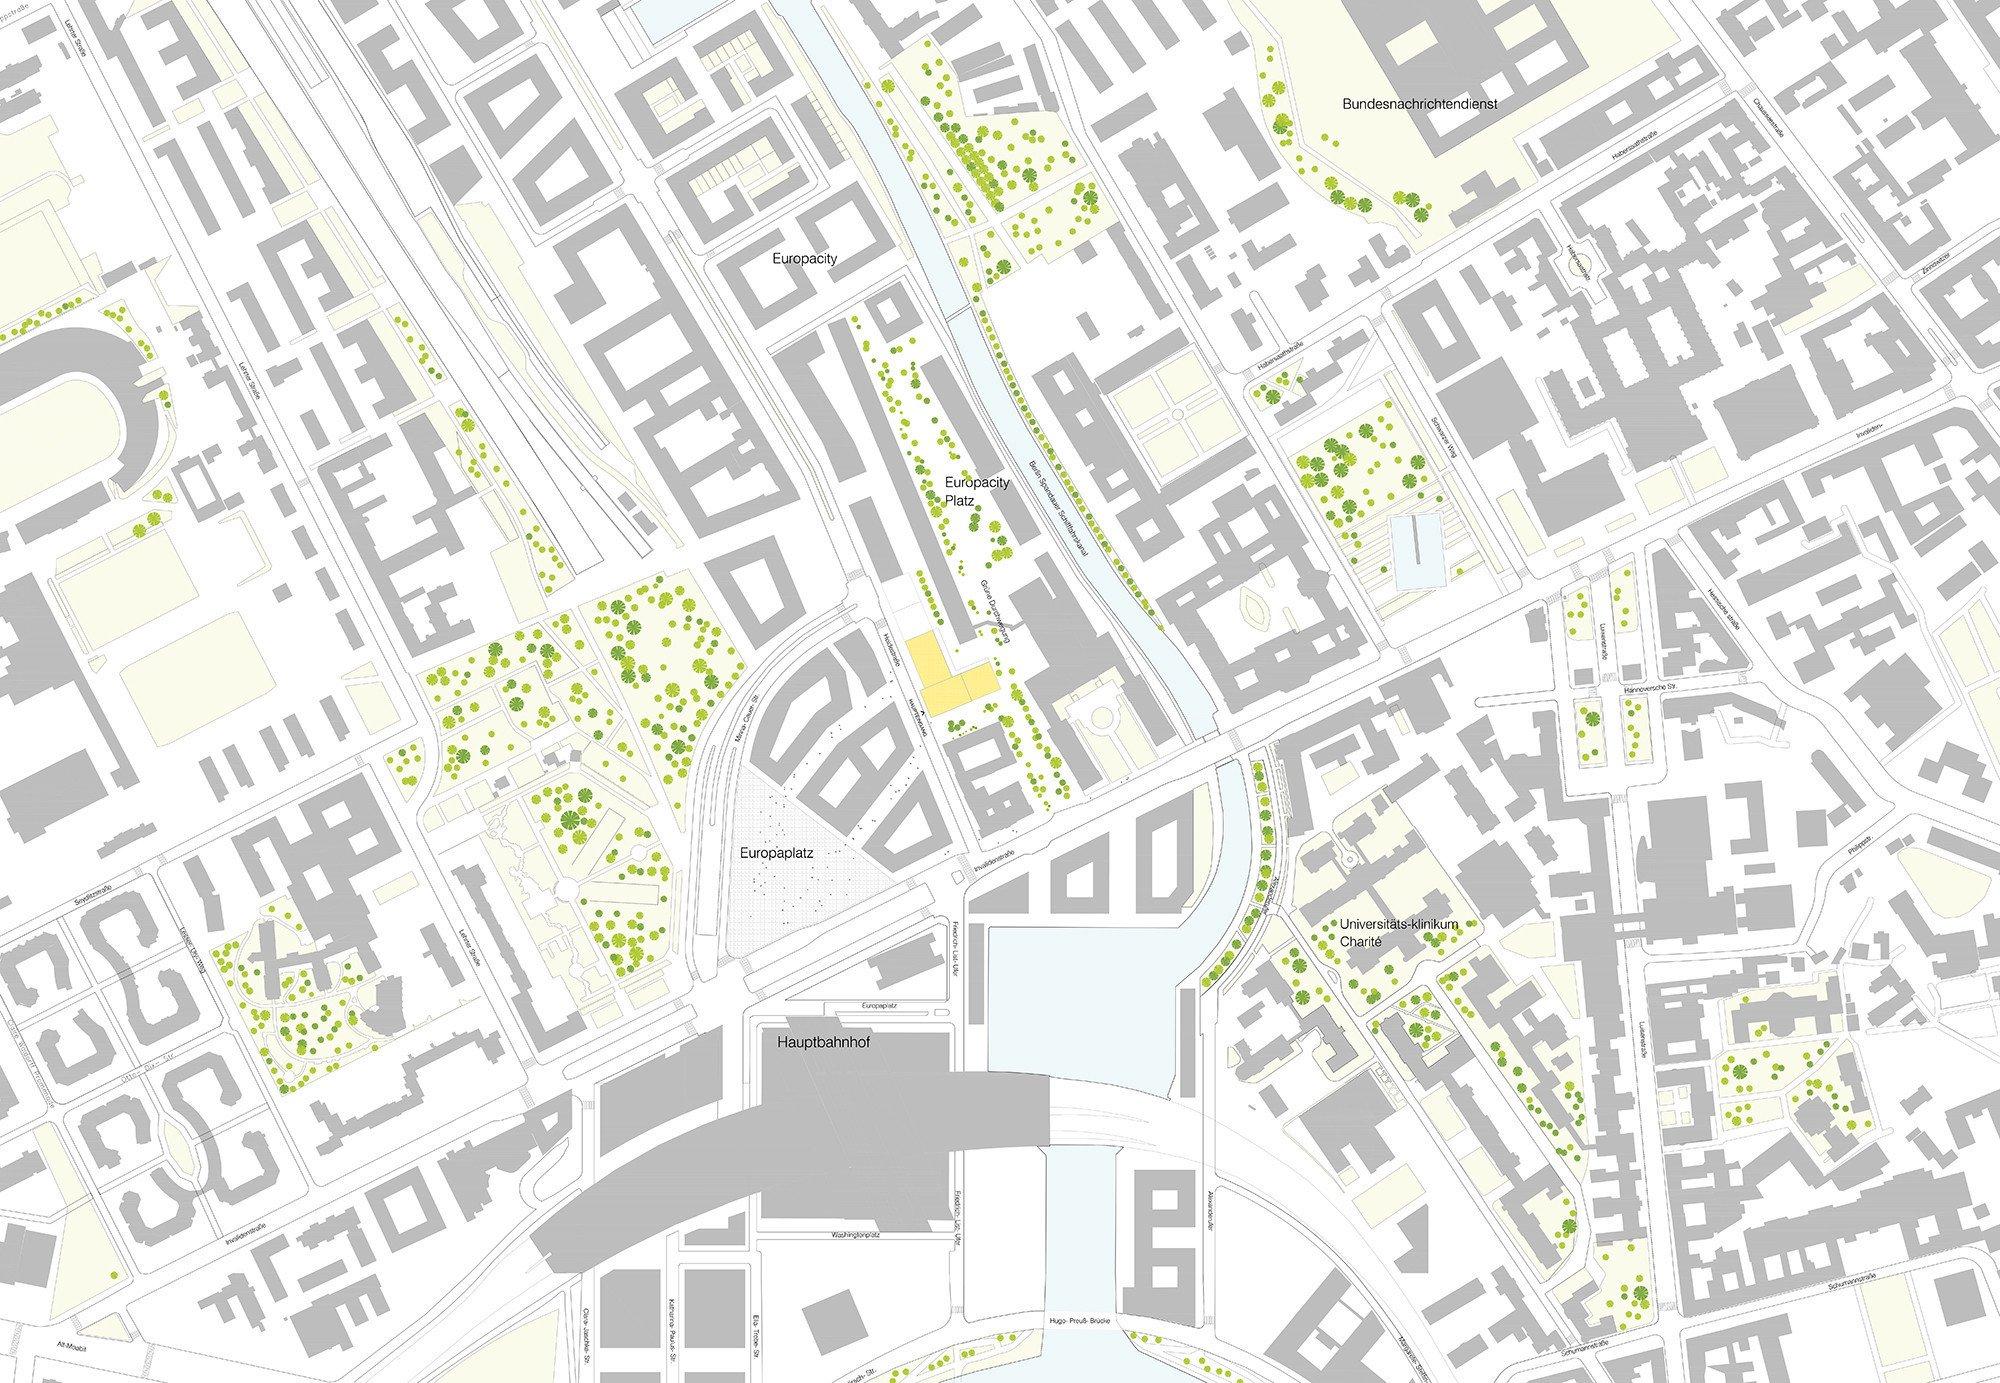 Unternehmenszentrale 50hertz in berlin geb udetechnik for Site plan rendering software